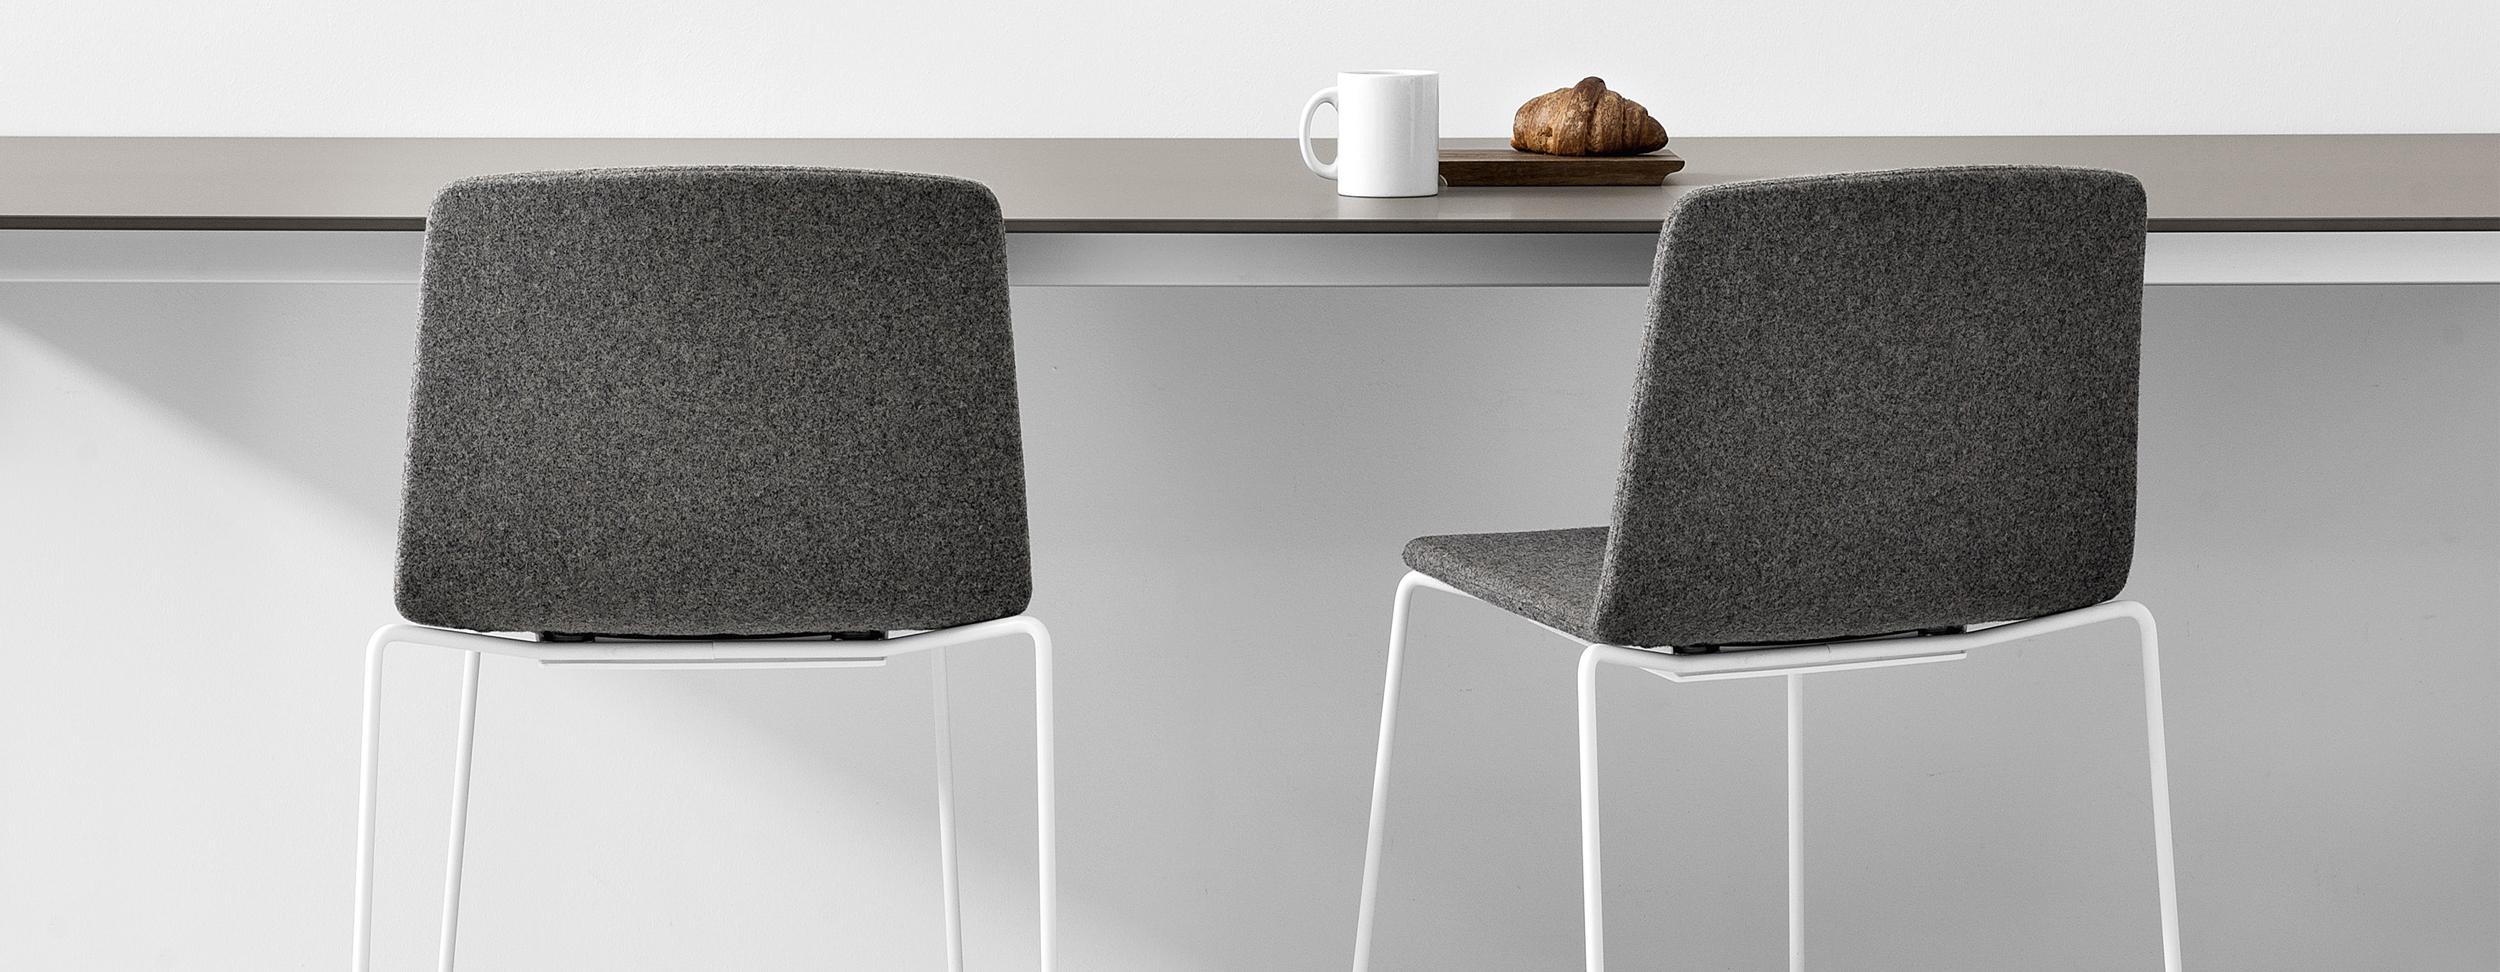 Phenomenal Designer Kitchen Stools Sydney Melbourne Fanuli Furniture Squirreltailoven Fun Painted Chair Ideas Images Squirreltailovenorg